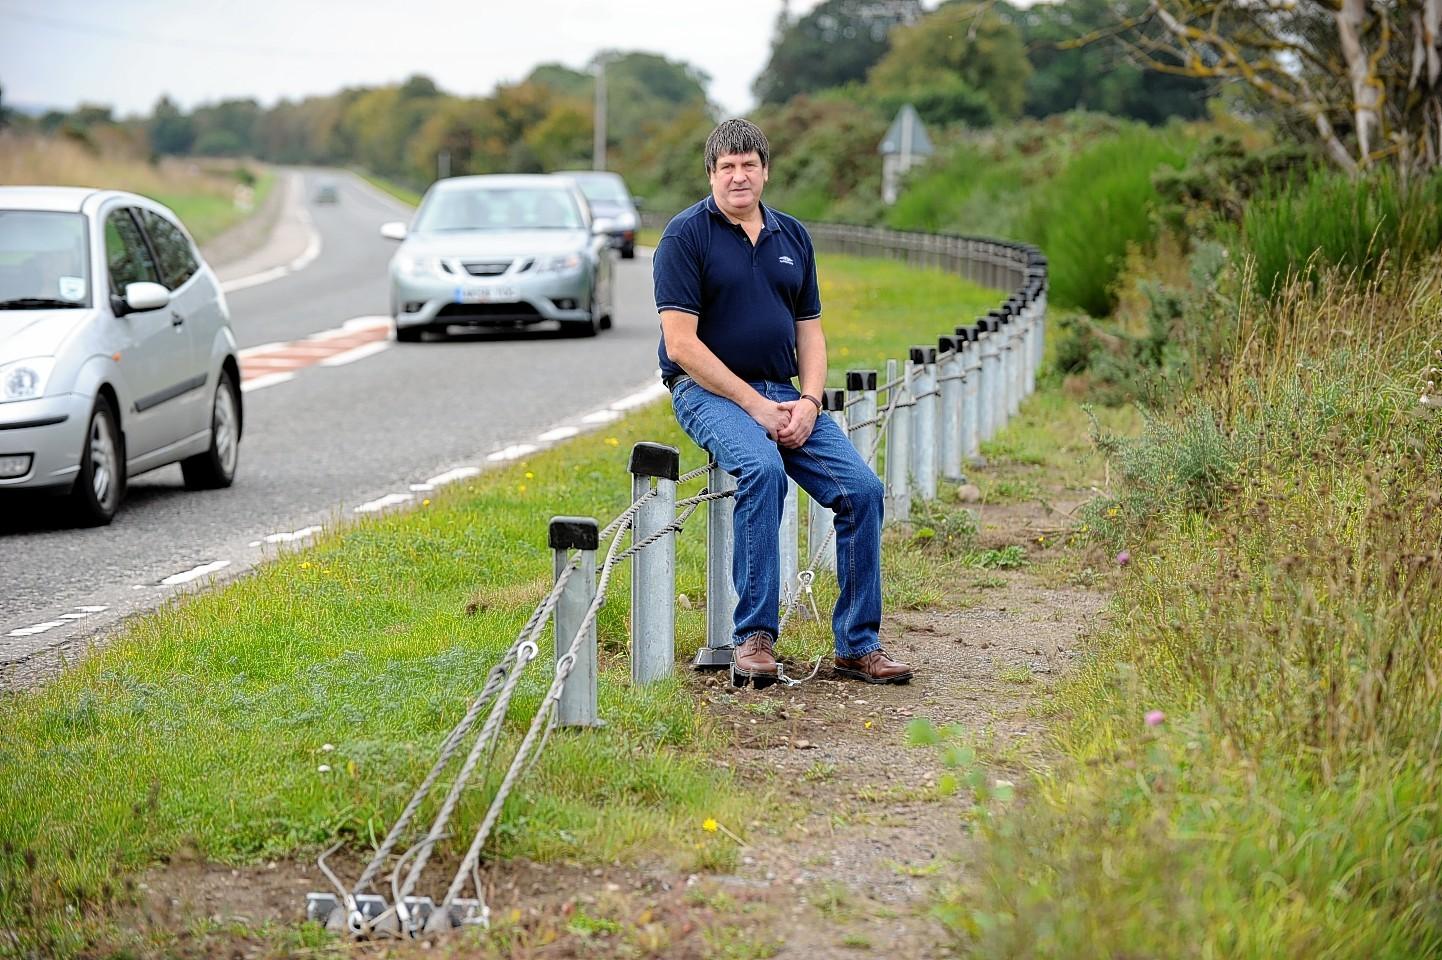 Neil Jeronim on the Moray cycle path